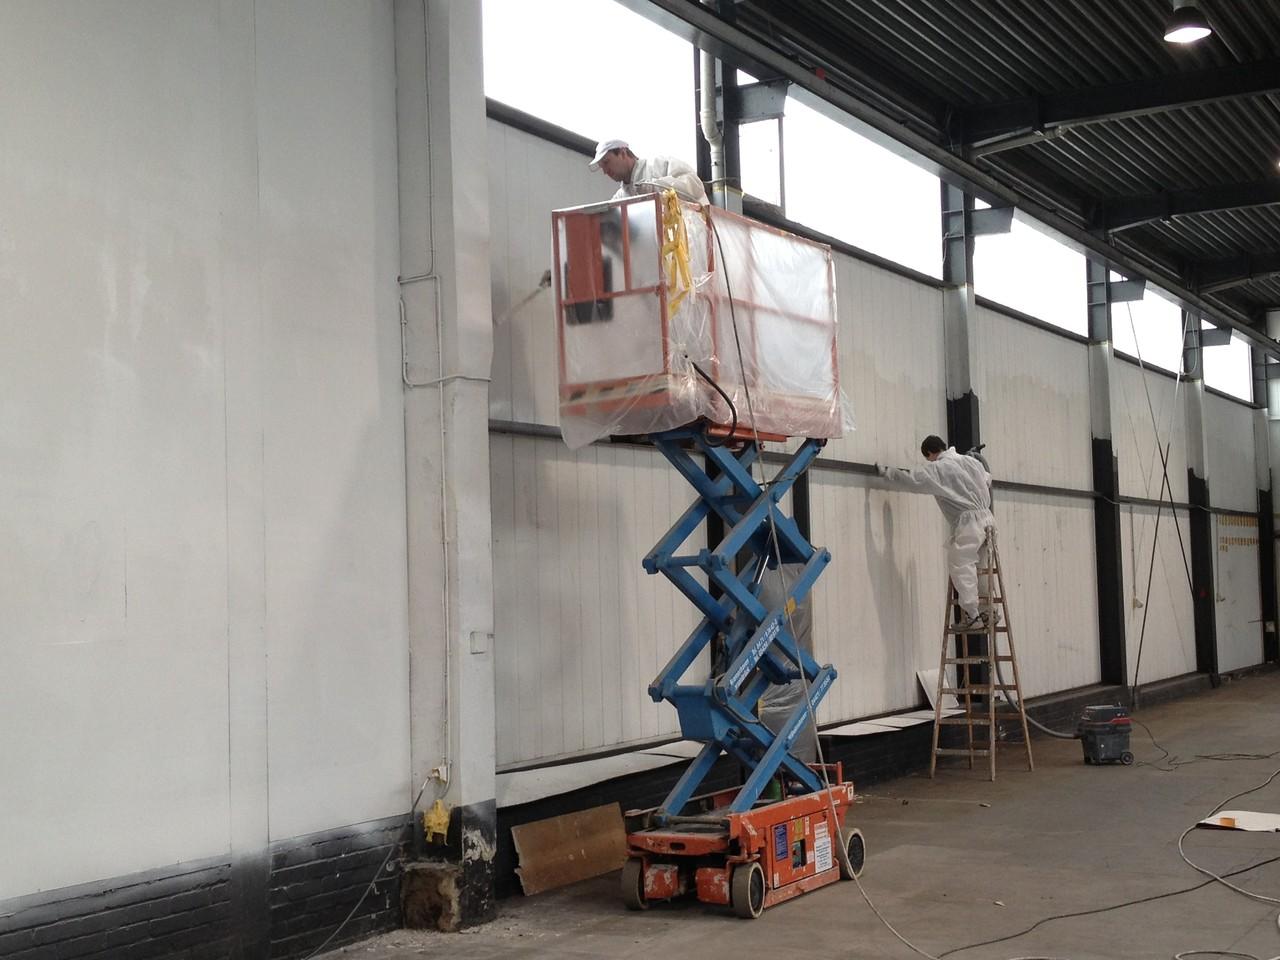 Wandbeschichtung im Airless-Spritzverfahren